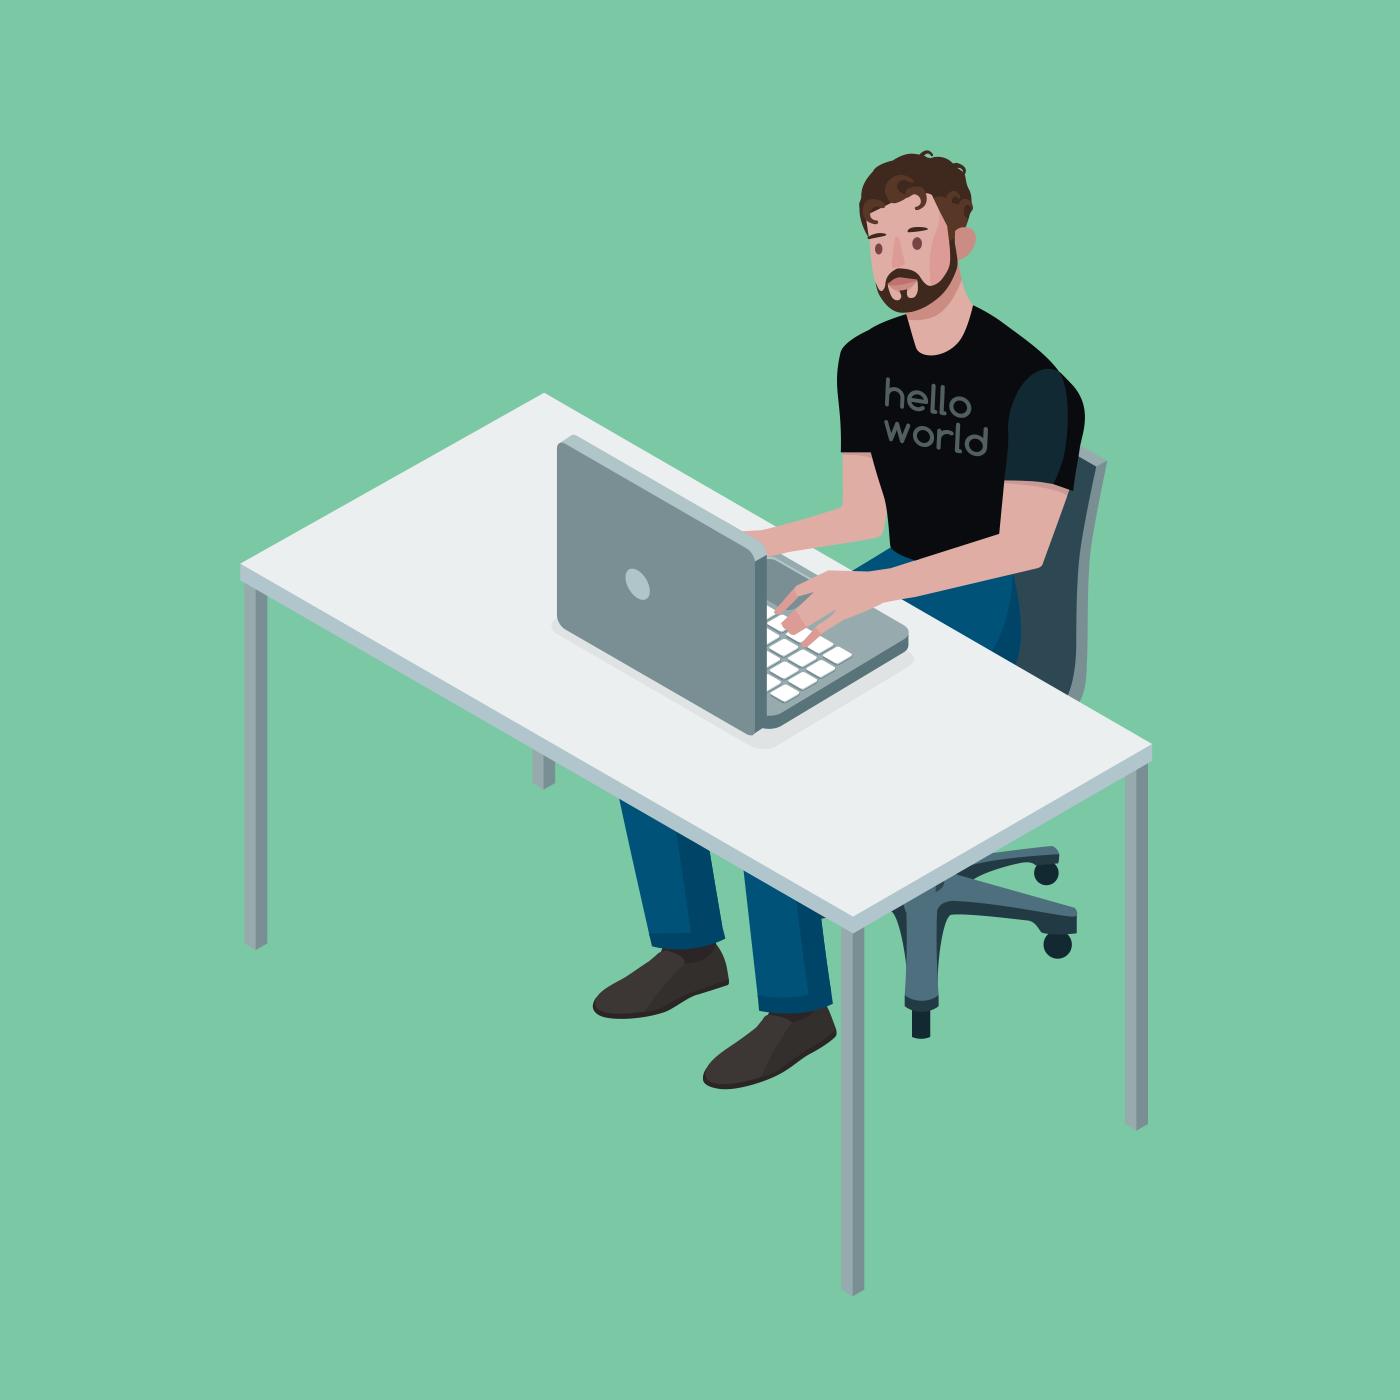 I received 2 job offers: 1: c++ / c# / unity developer for a VR